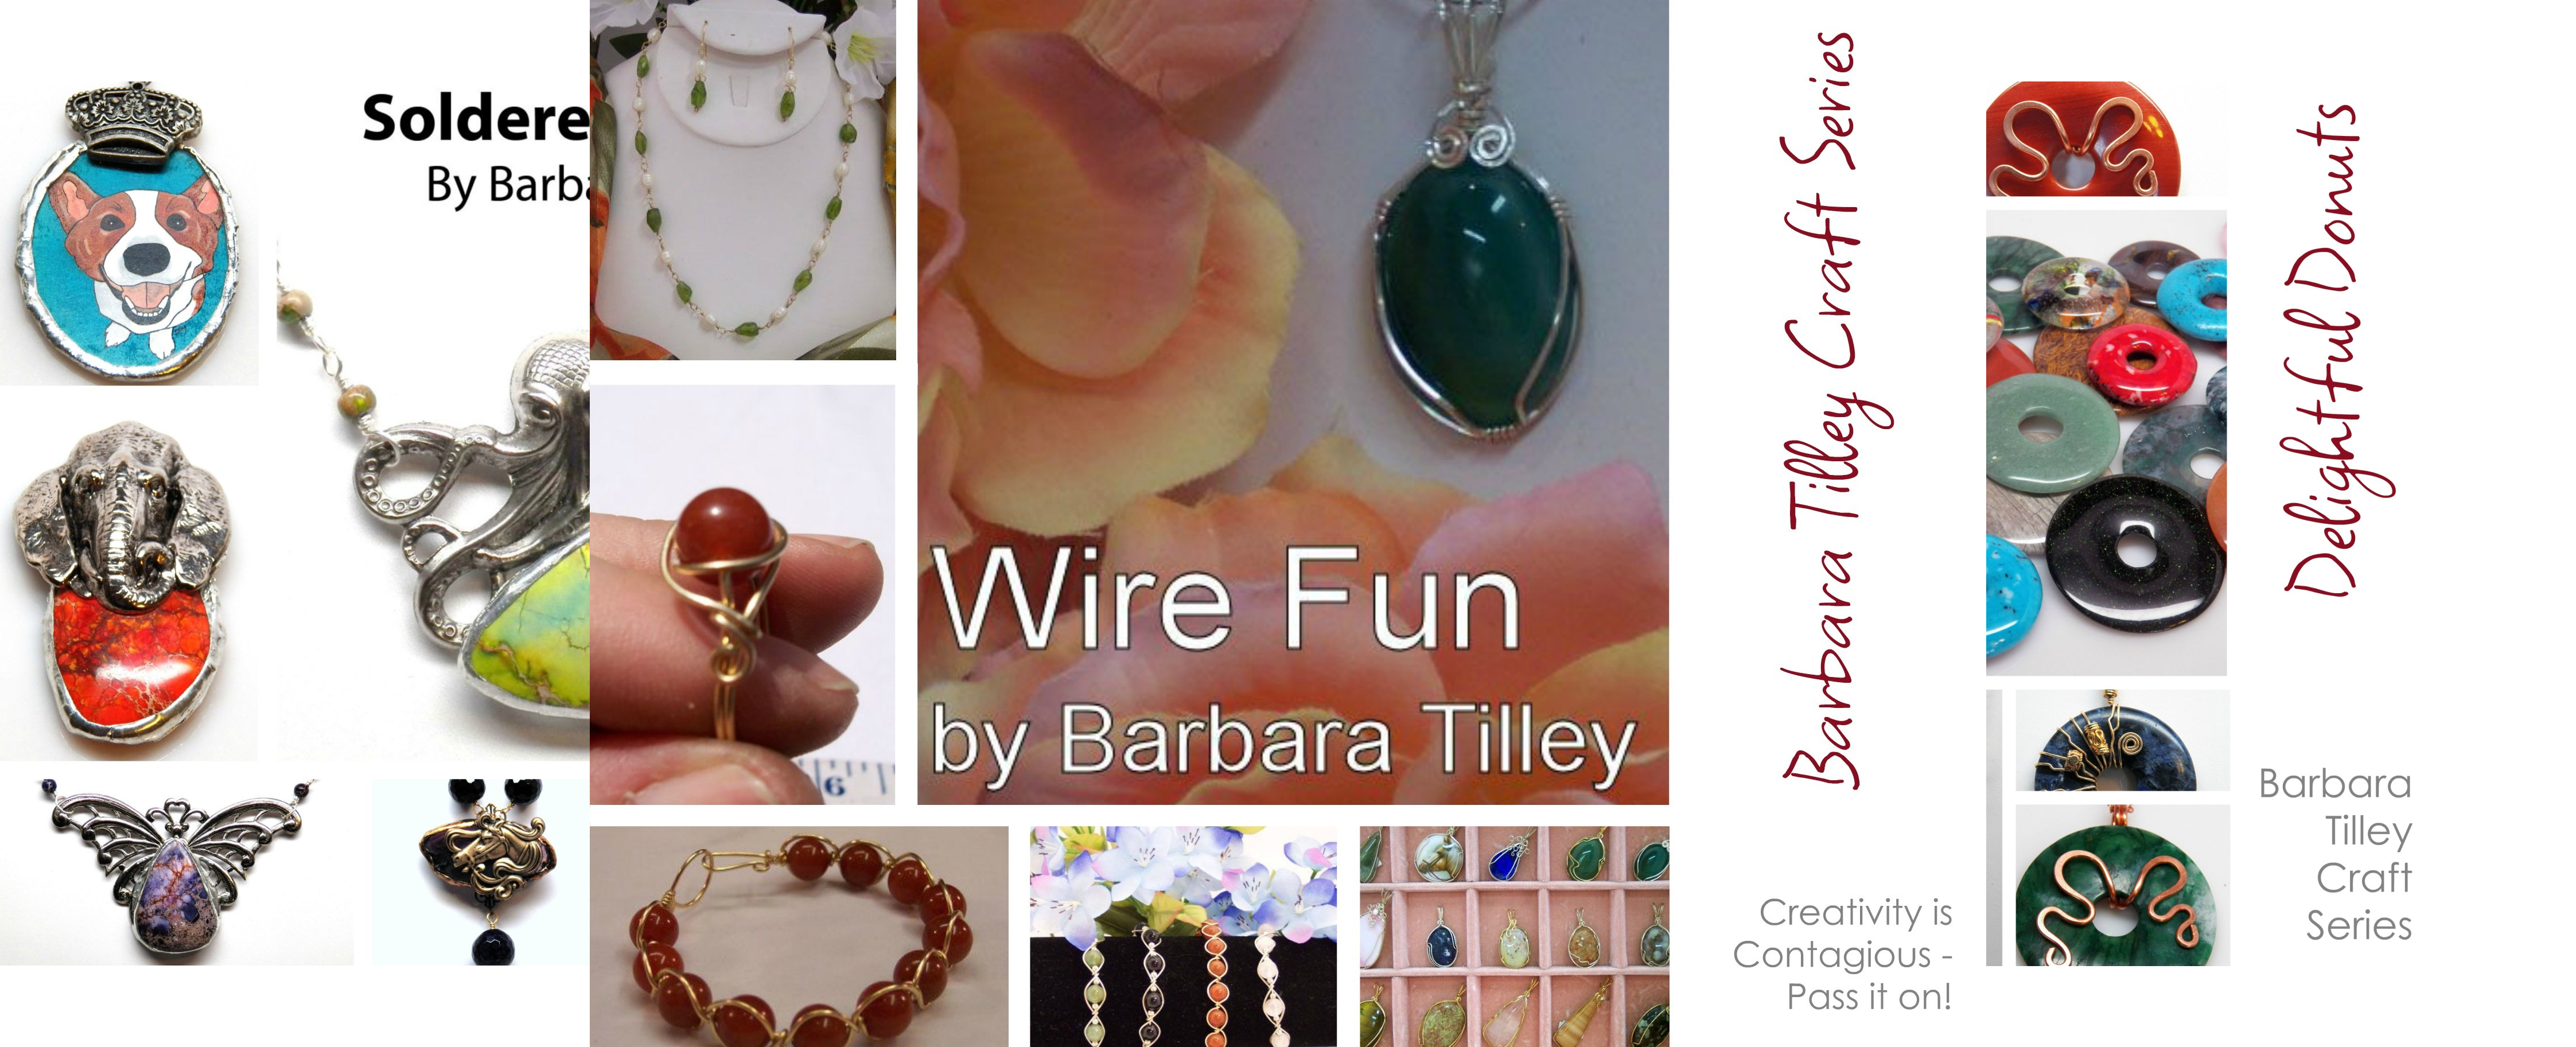 Barbara Tilley Craft Series (3 Book Series)